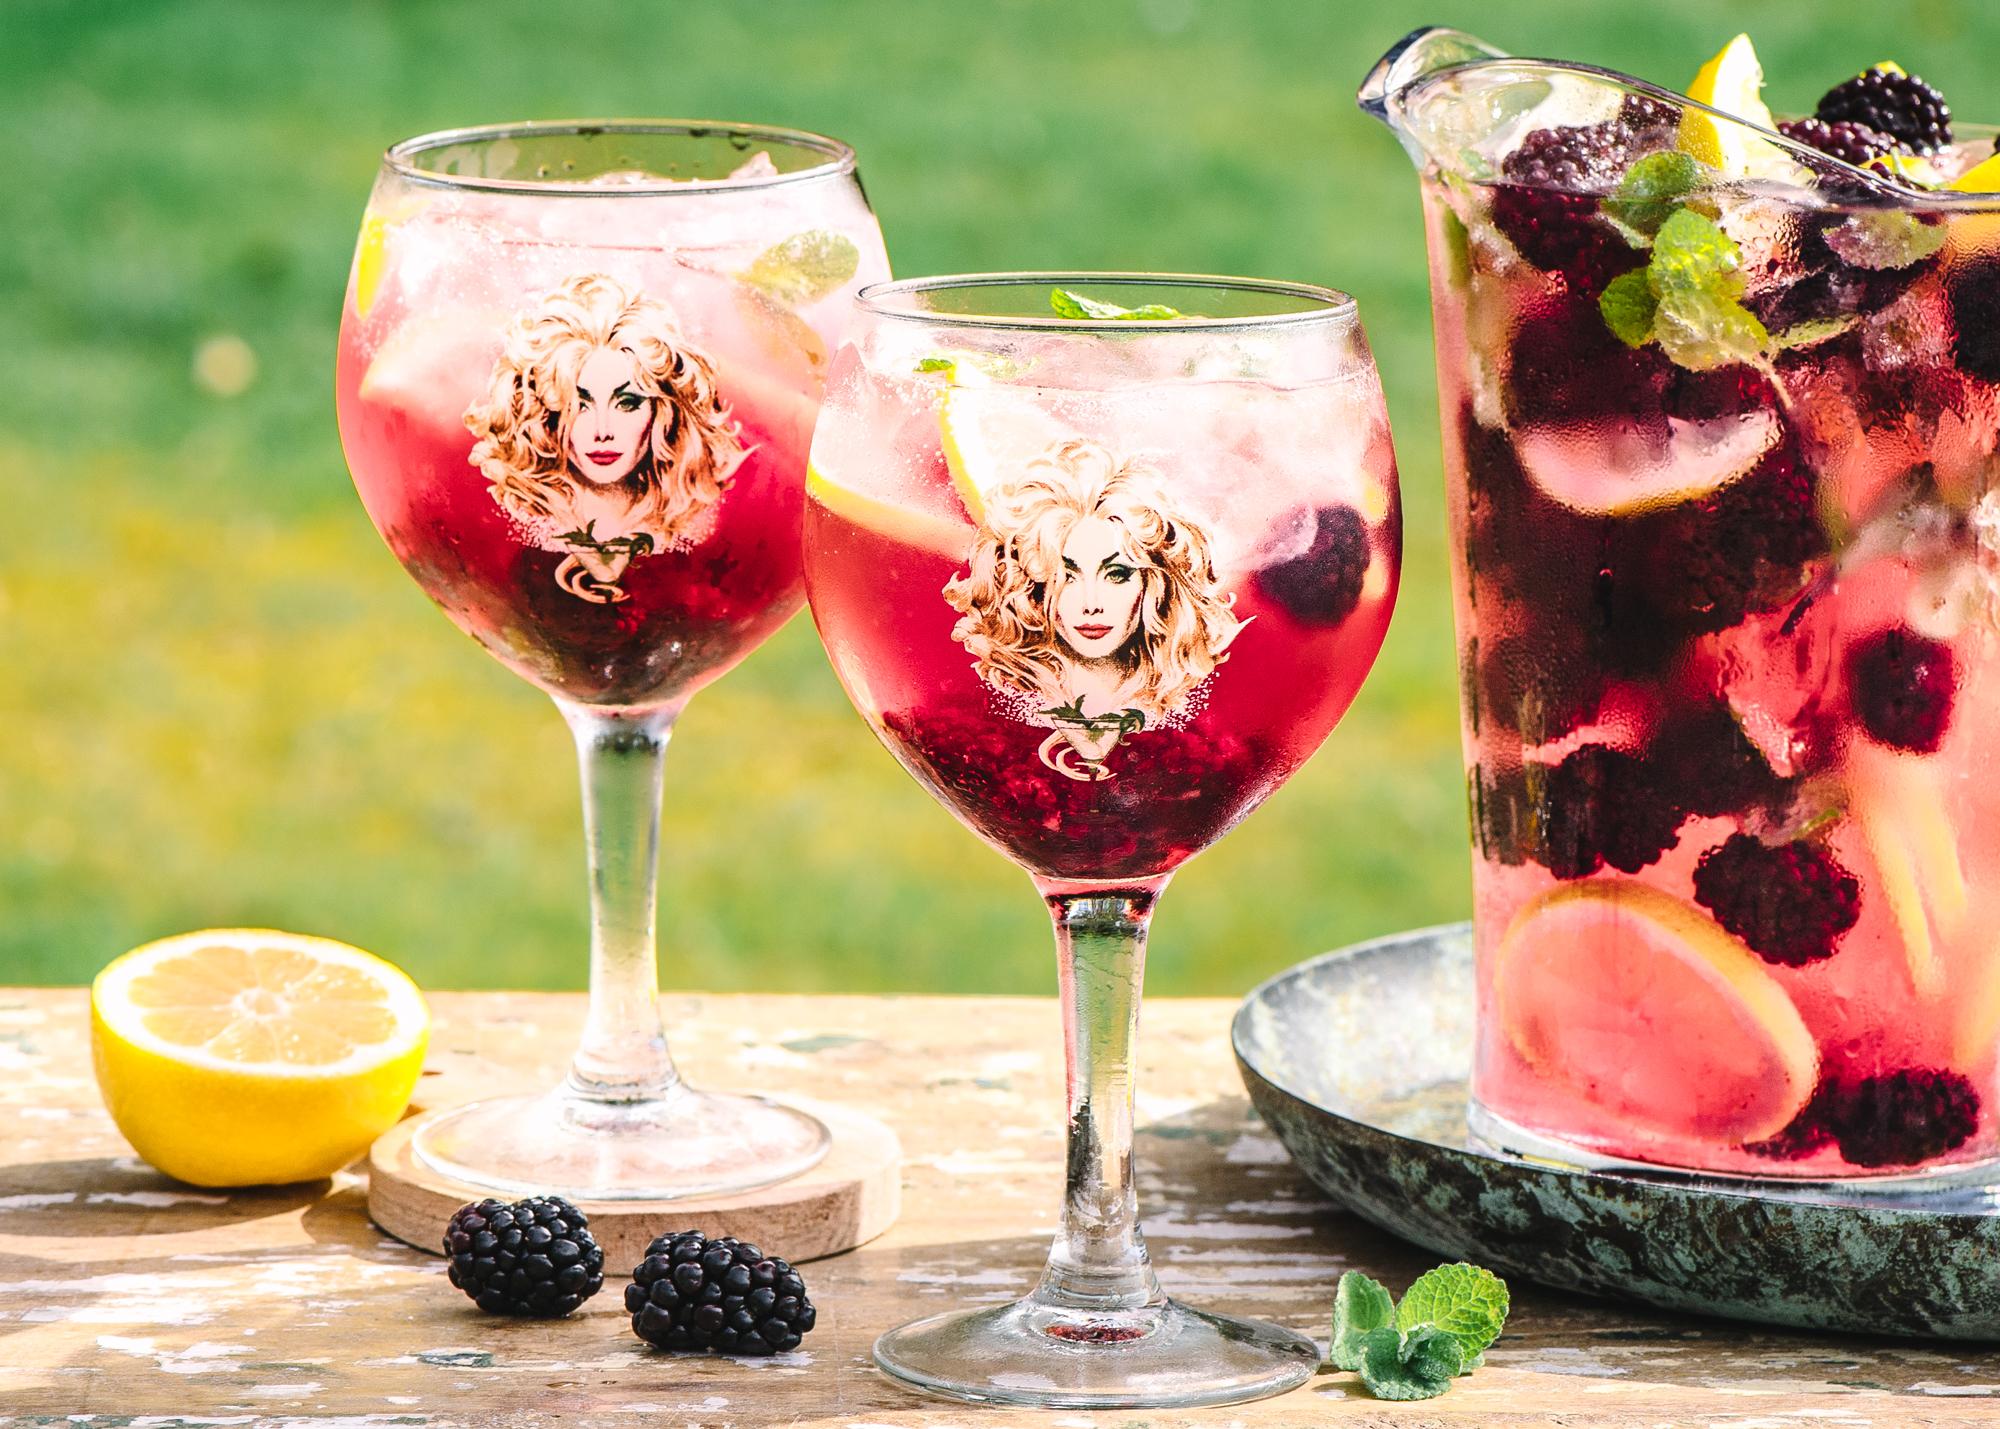 Daffy's Mulberry Gin Spritz